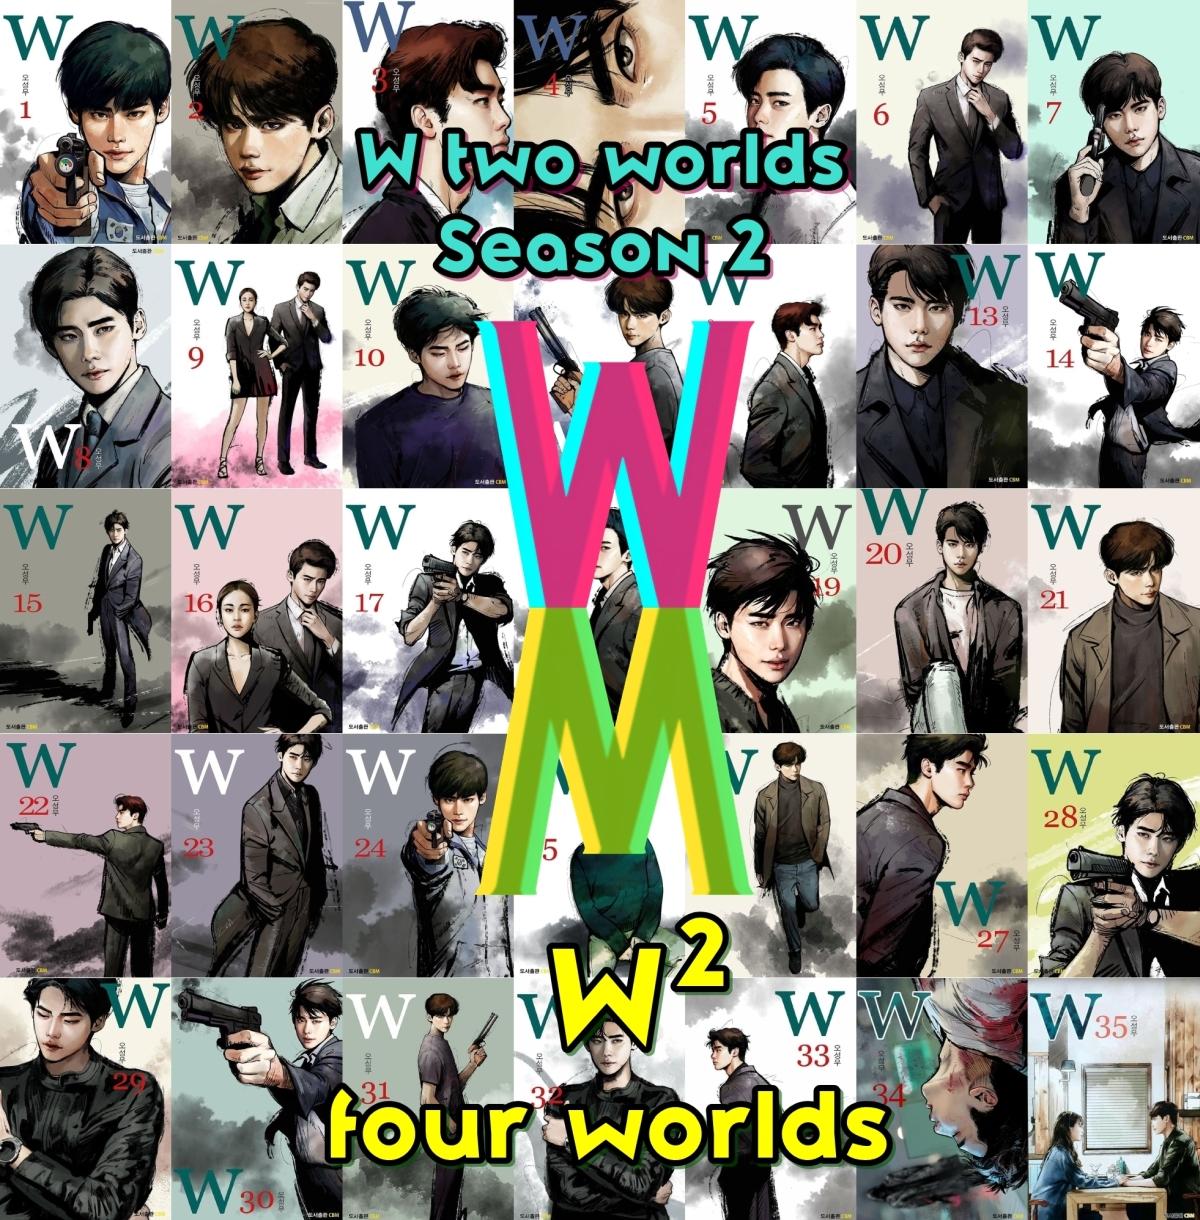 W two worlds - Season 2 - four worlds (US) - Asianfanfics